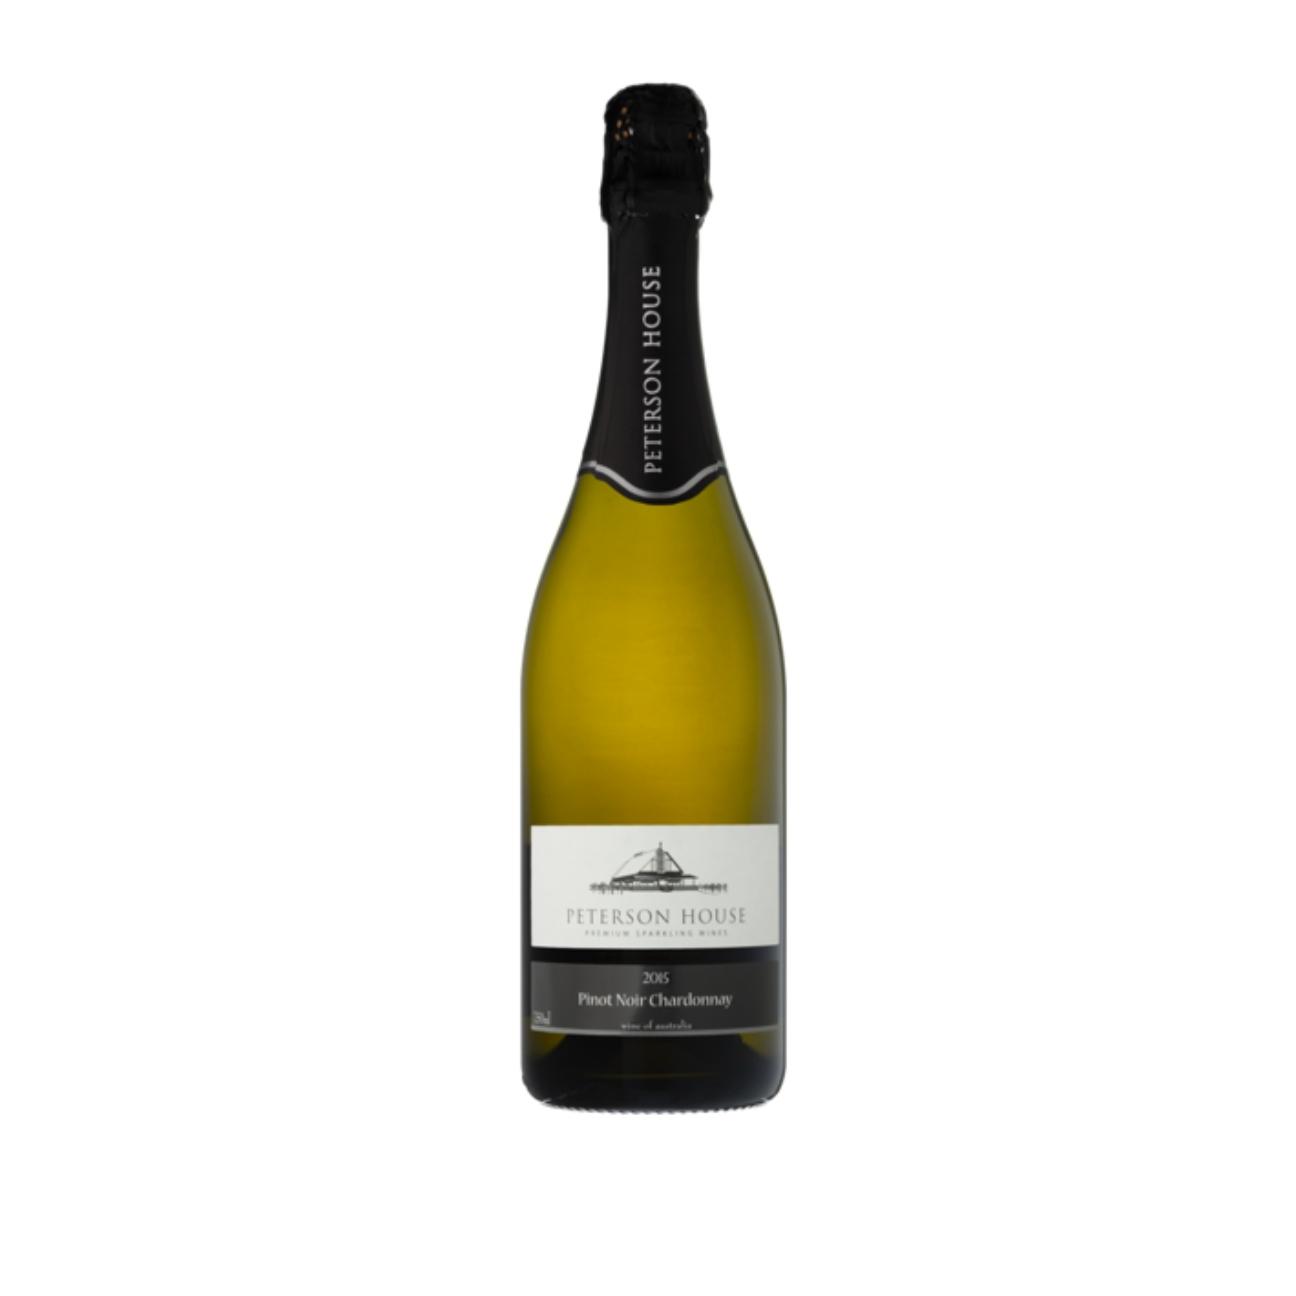 Petersons House Pinot Noir Chardonnay